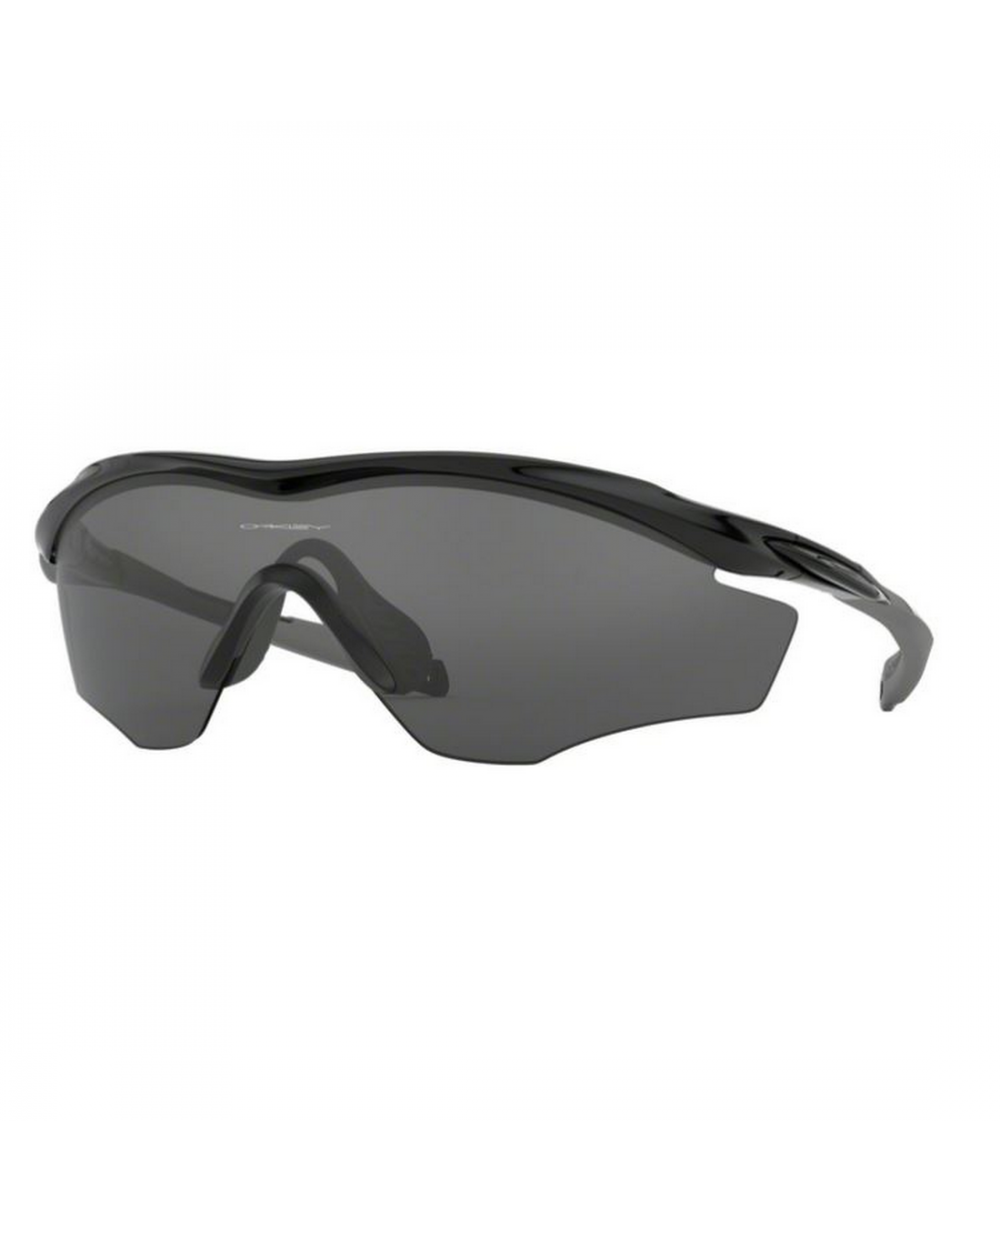 Oakley lunettes de soleil 9343 M2FRAME emballage d'origine garantie italie